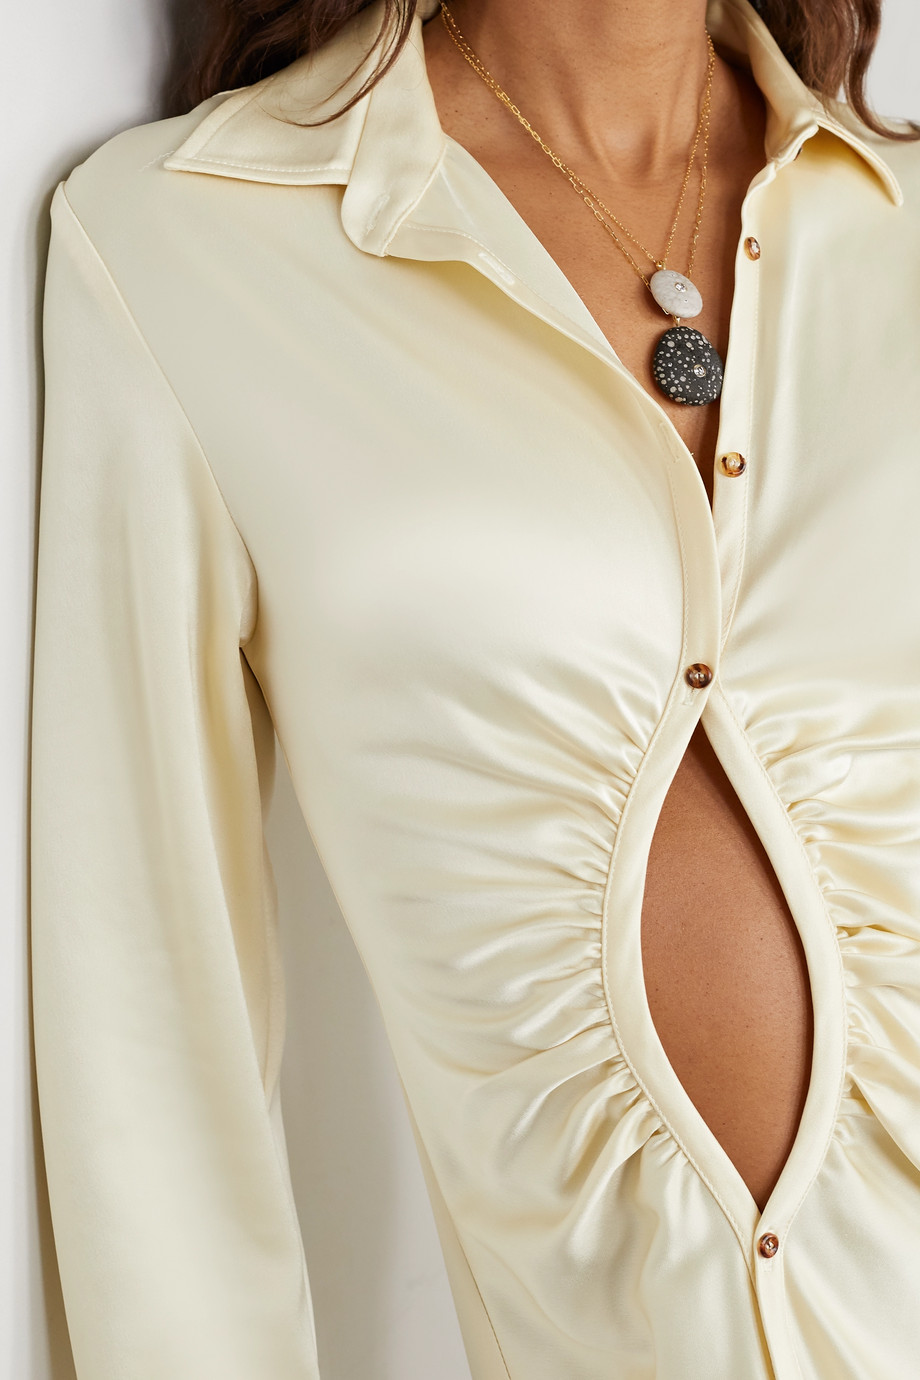 CVC Stones Focal 18-karat gold, stone and diamond necklace